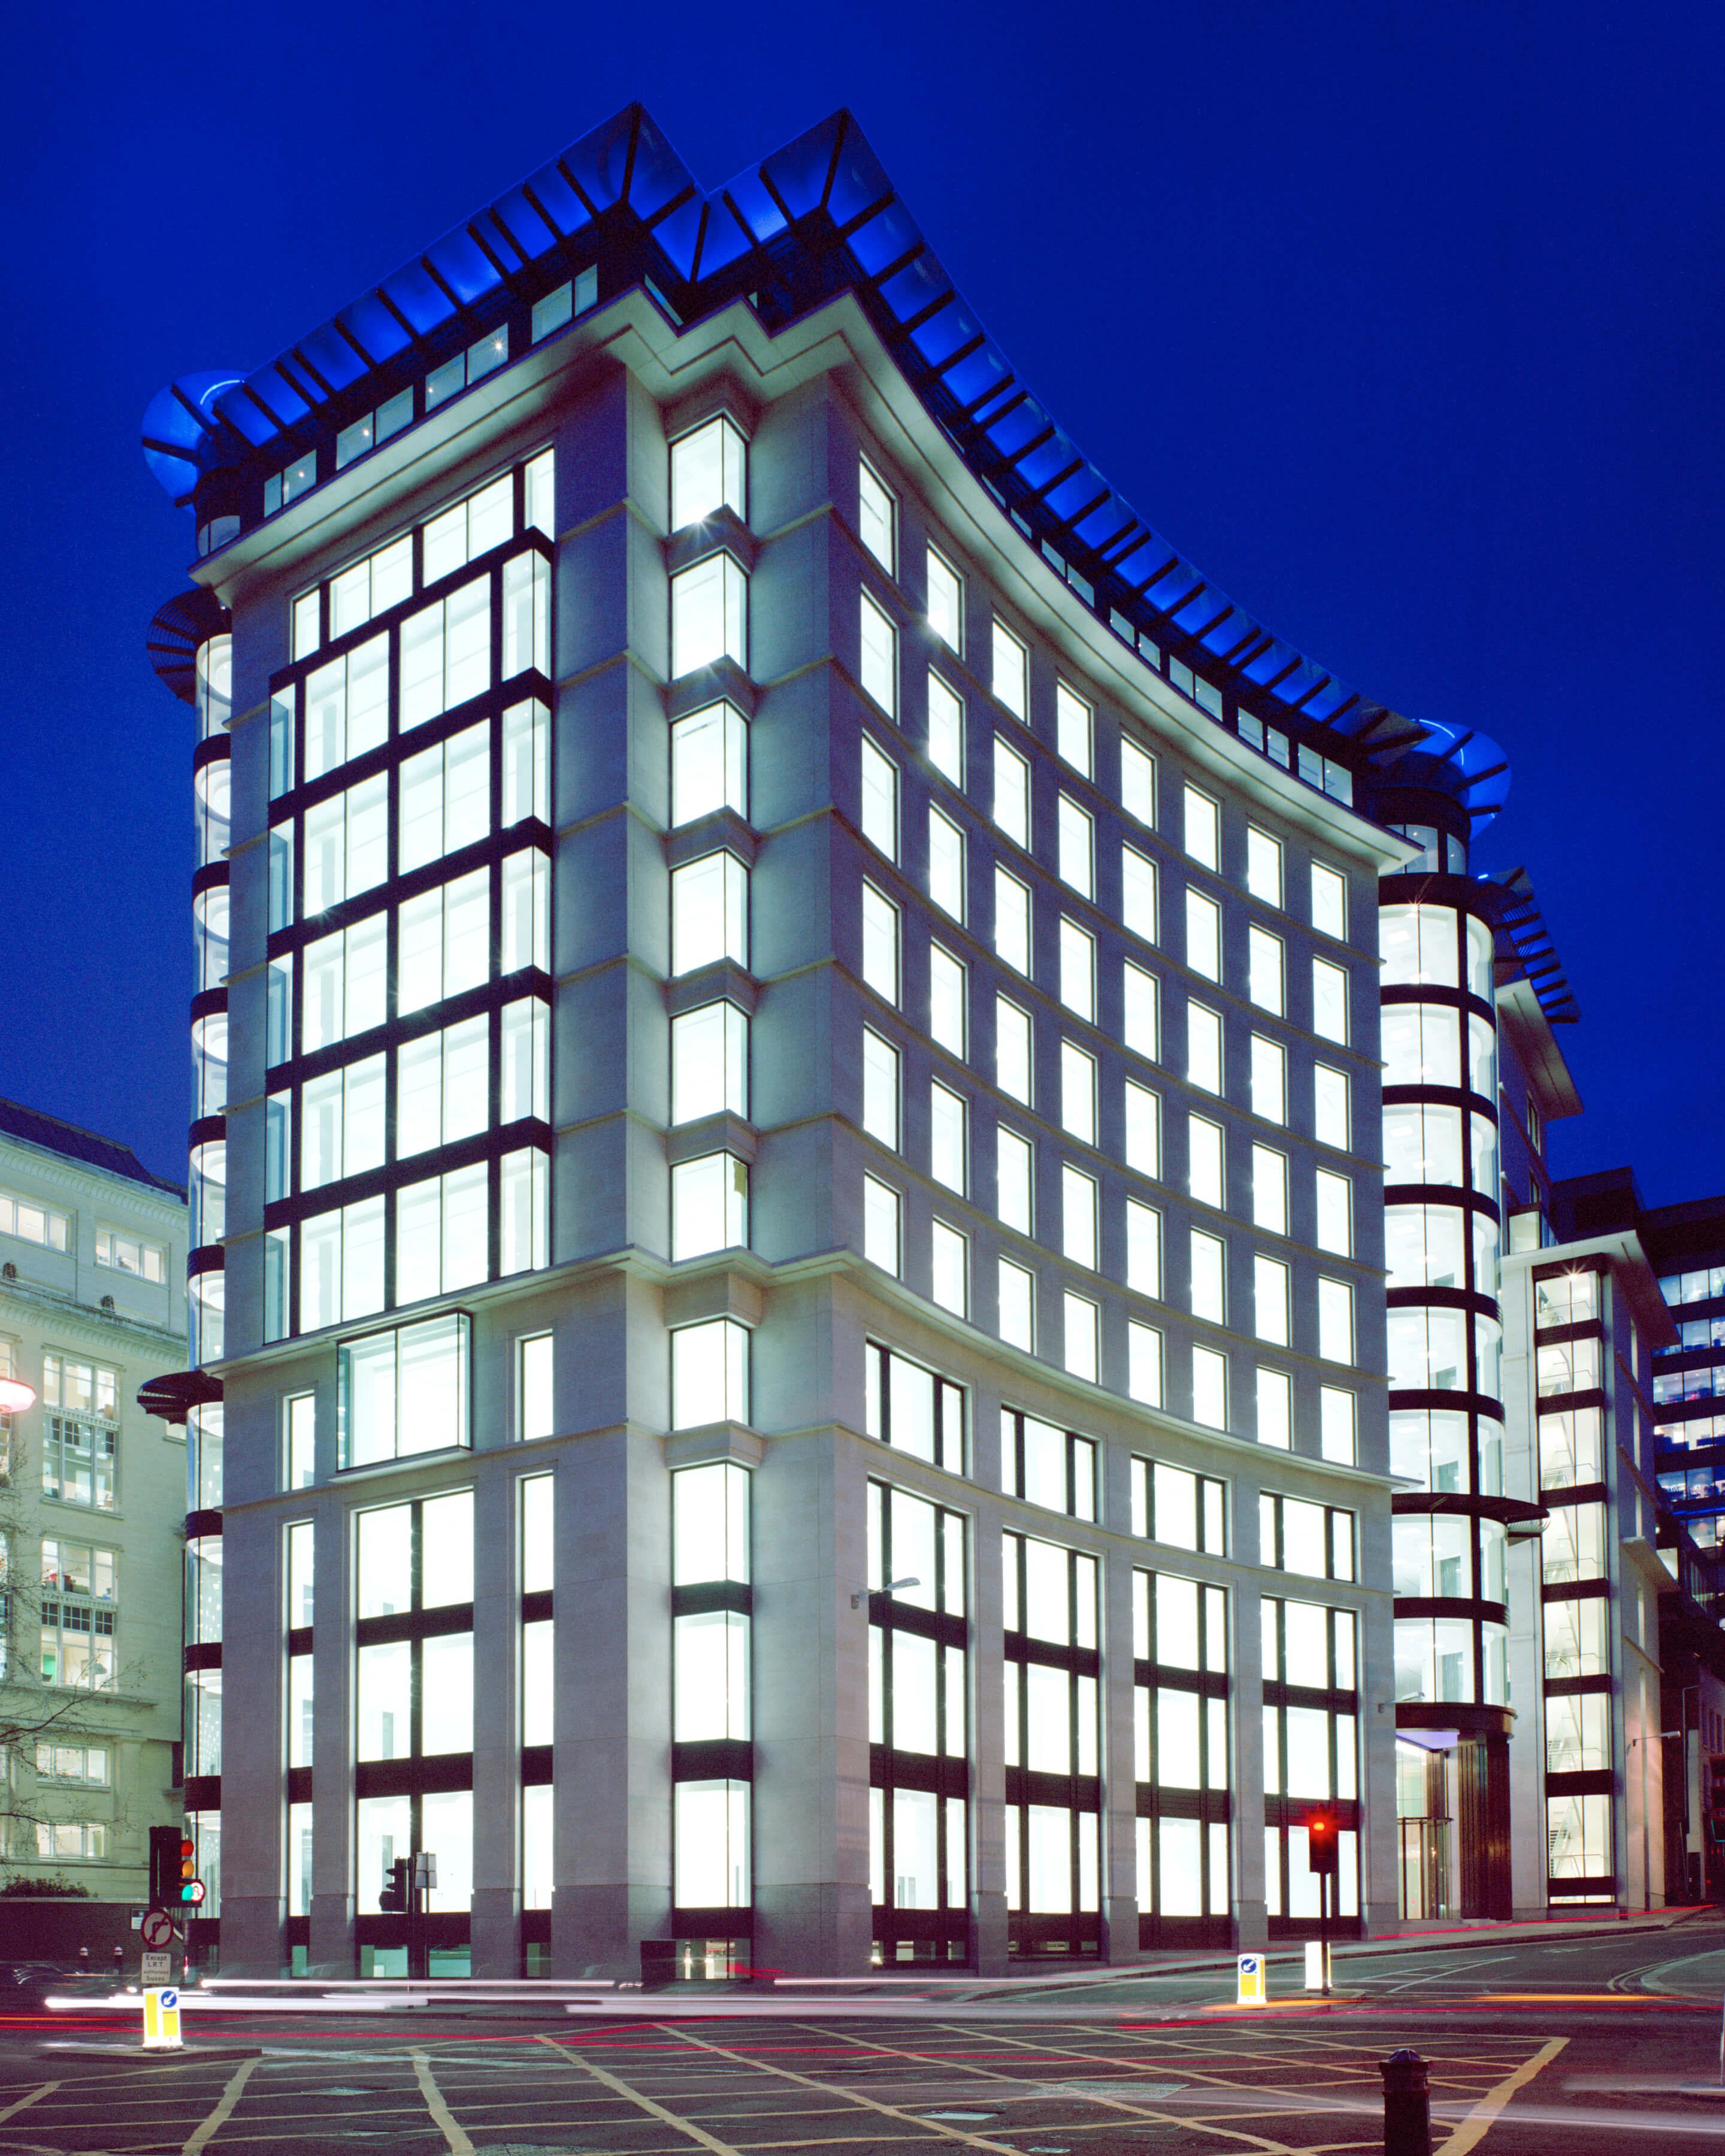 Arthur Street, London, EC4R 9AQ - Residents, Businesses ...